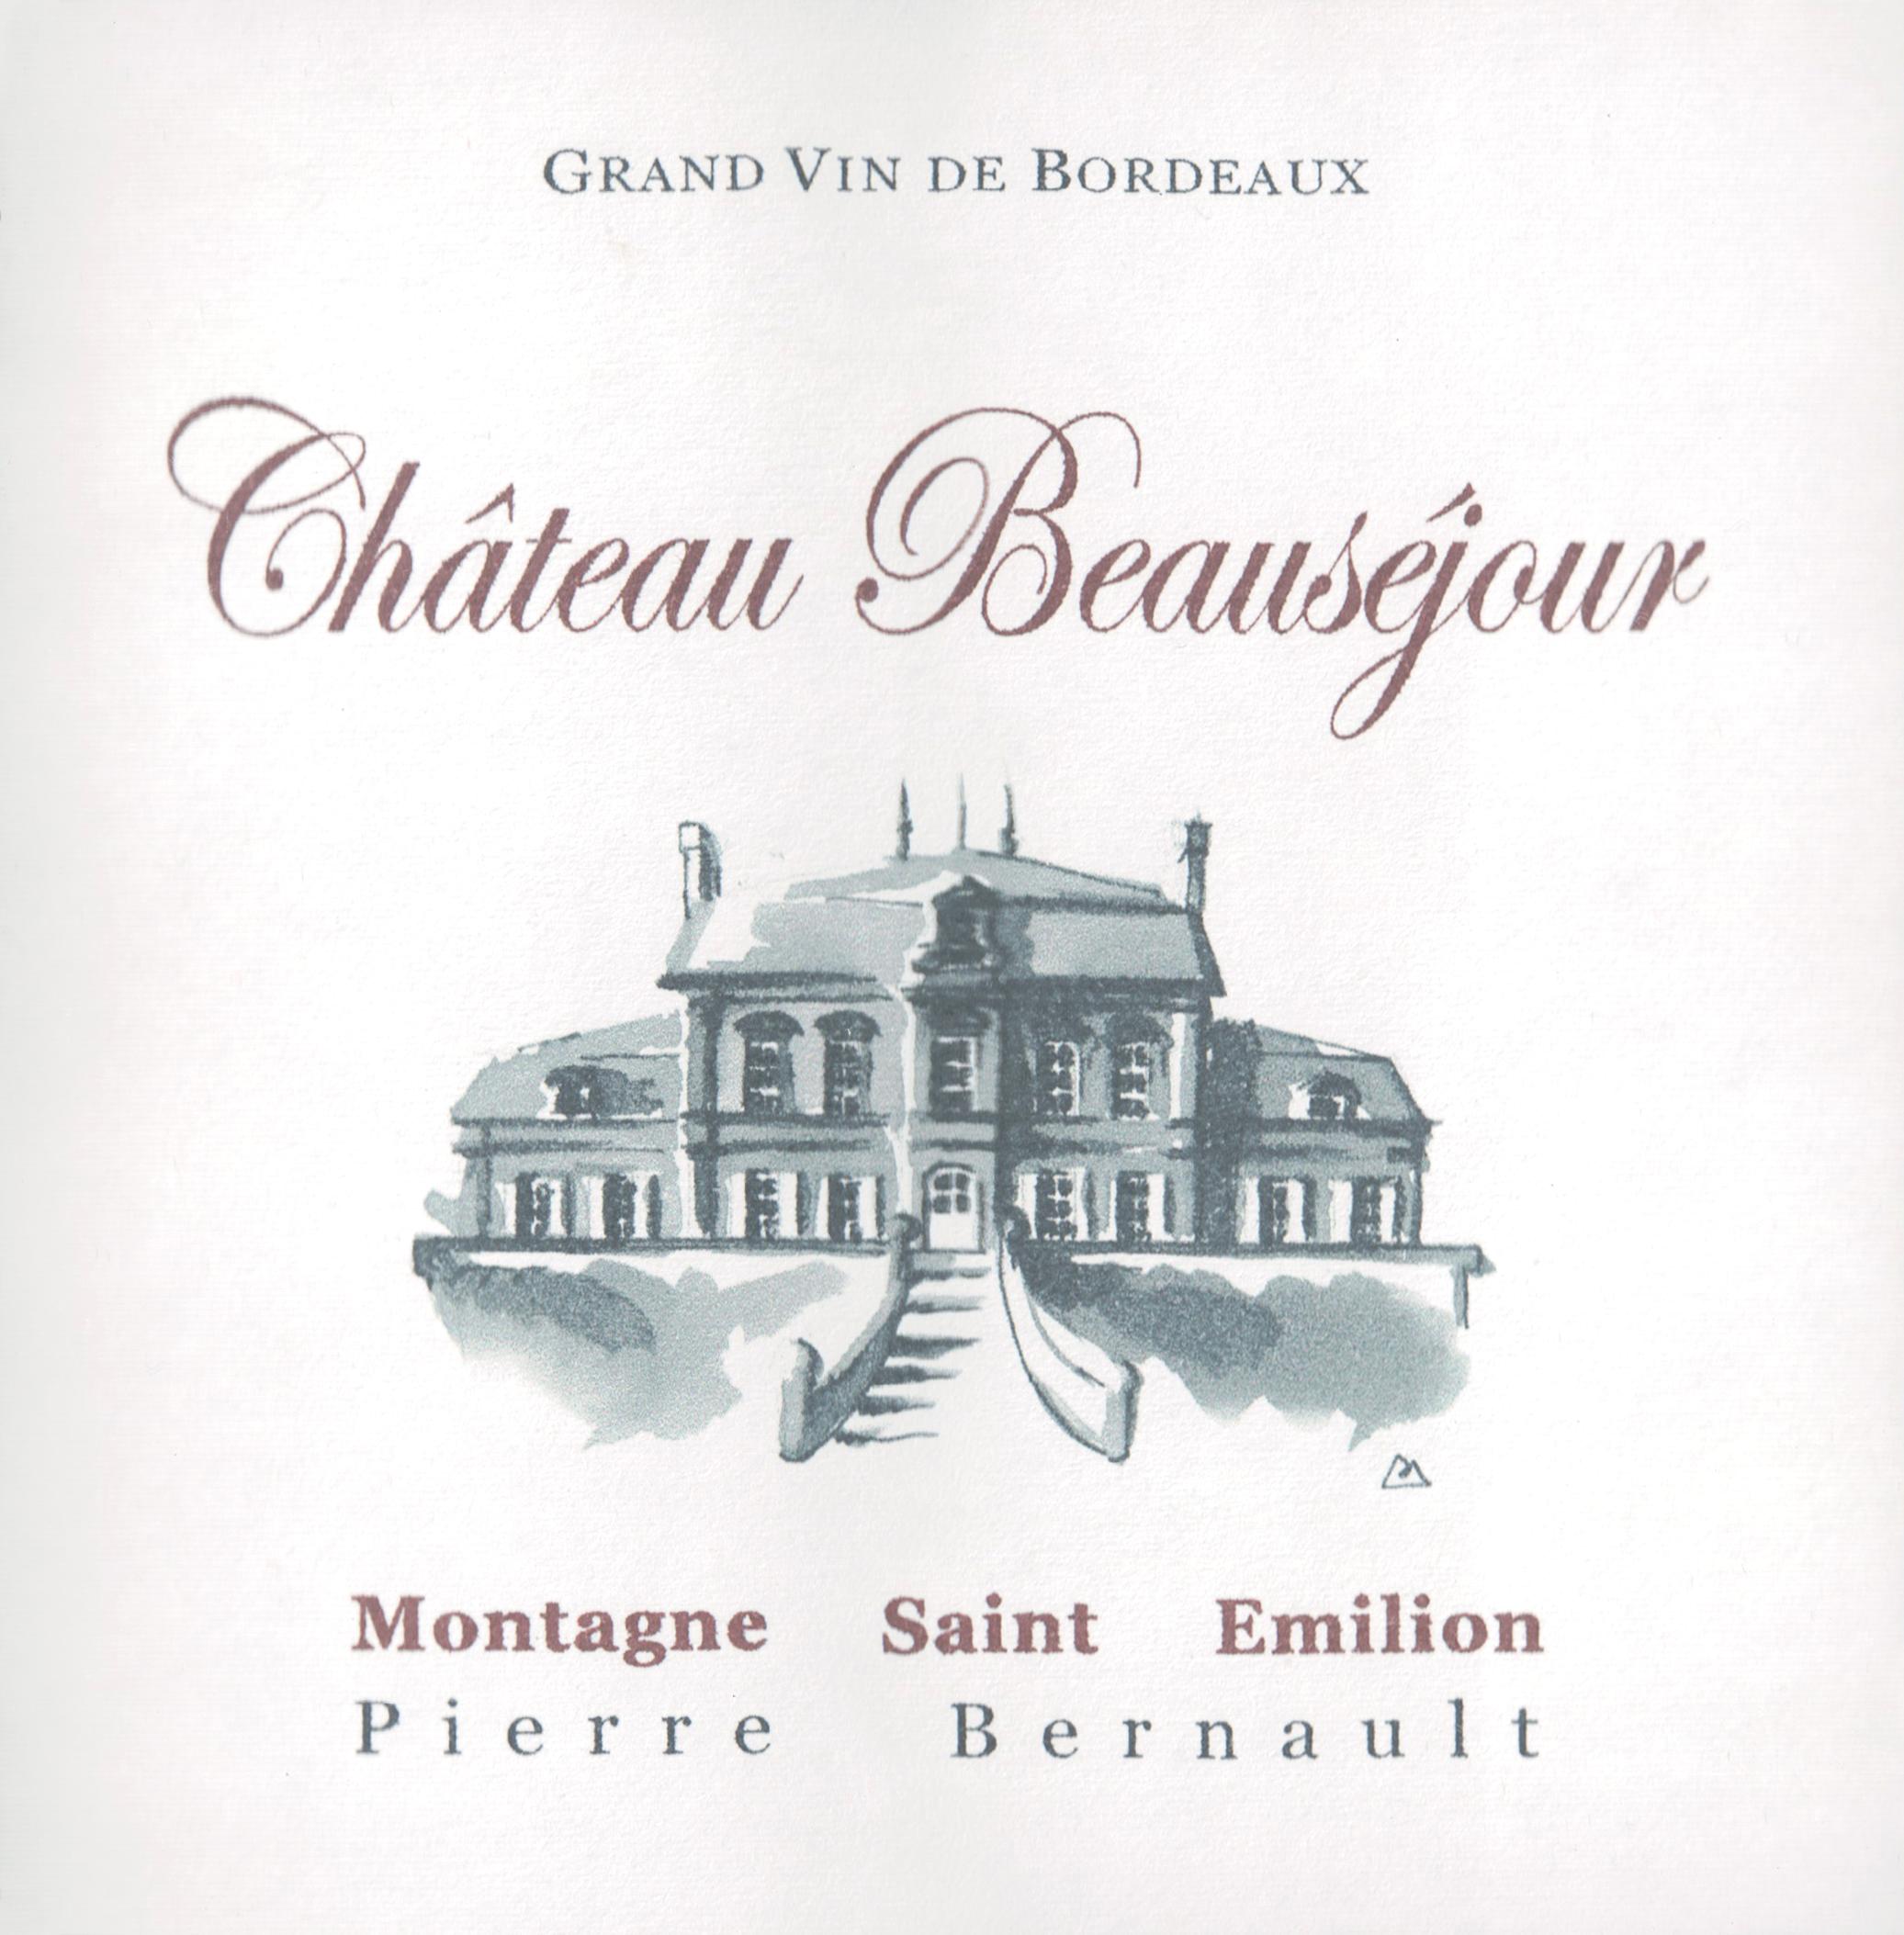 """Chateau Beausejour Montagne """"Beausejour"""" 2012"""